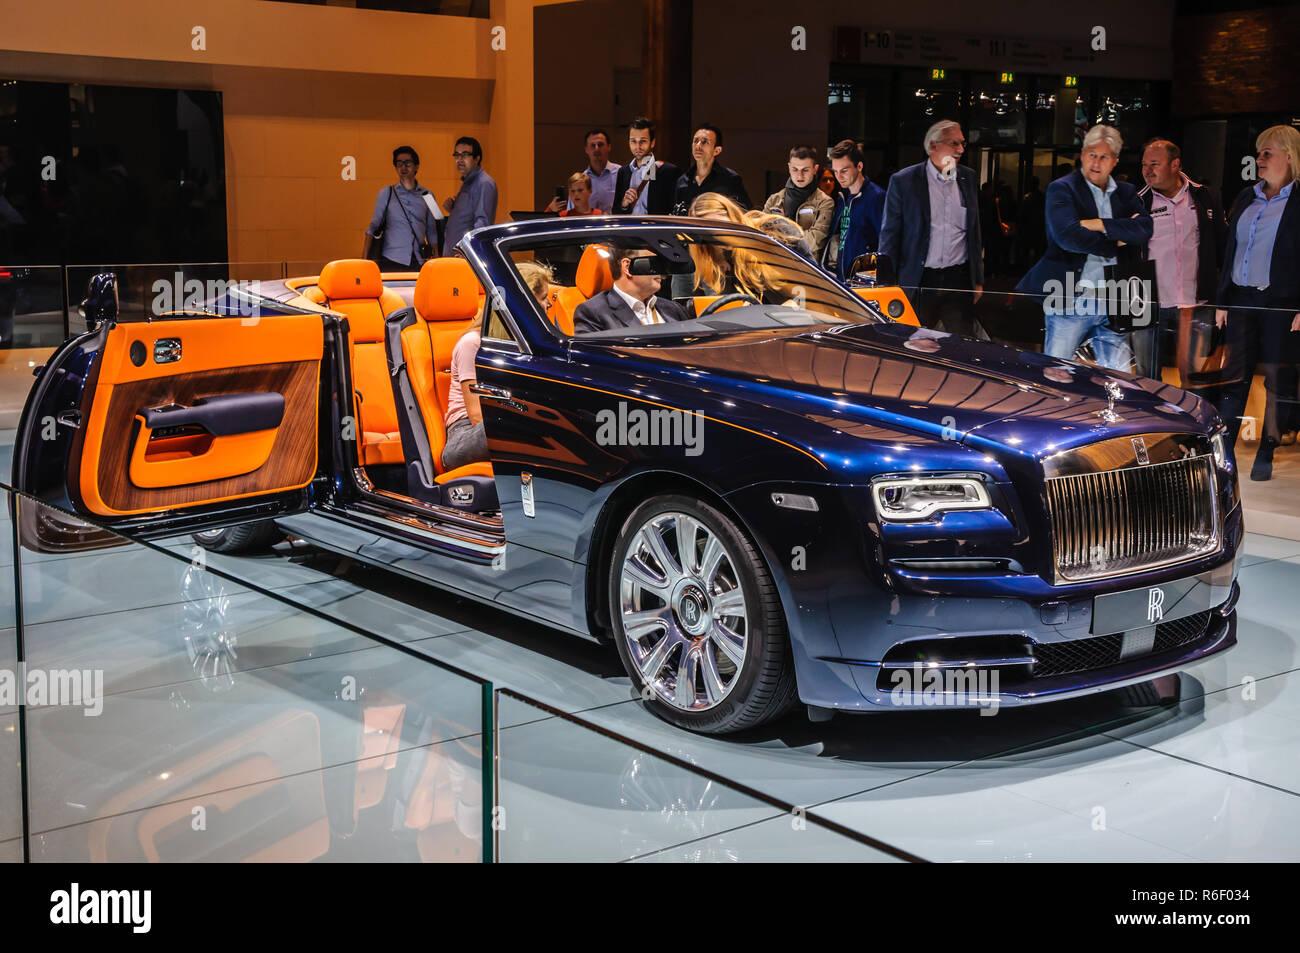 FRANKFURT - SEPT 2015: presented at IAA International Motor Show on September 20, 2015 in Frankfurt, Germany Stock Photo